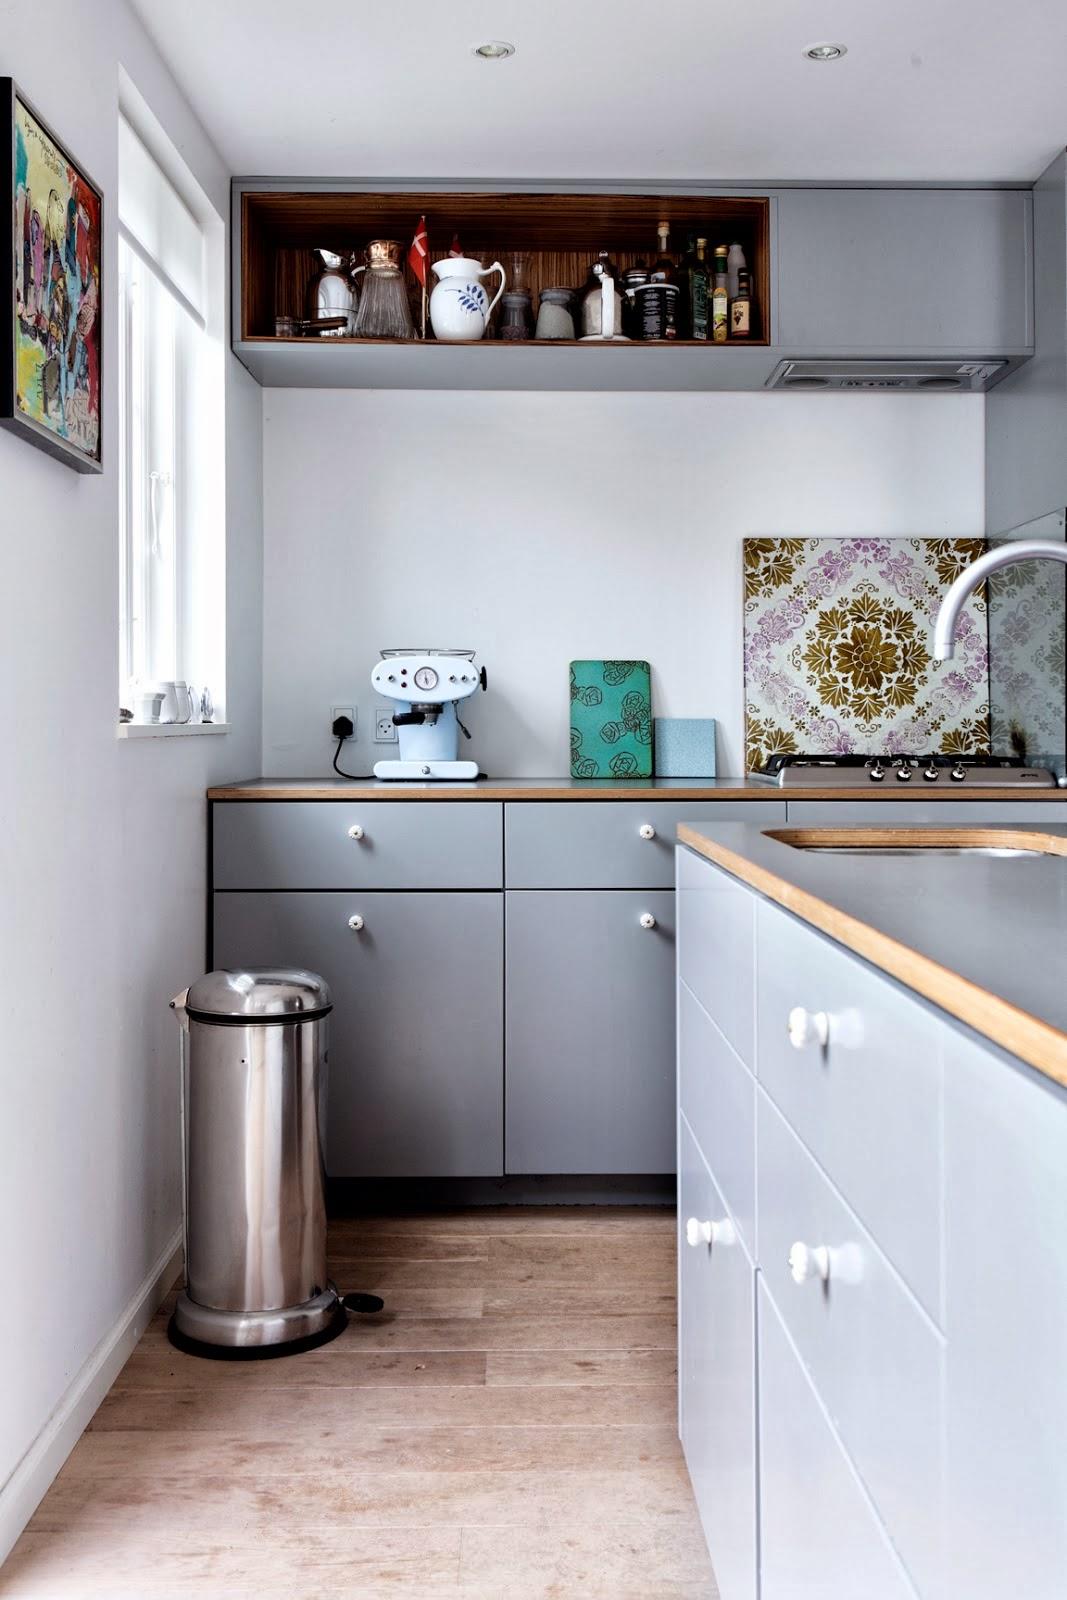 Seaseight design blog 5 ideas to steal week 25 for Piastrelle paraspruzzi cucina